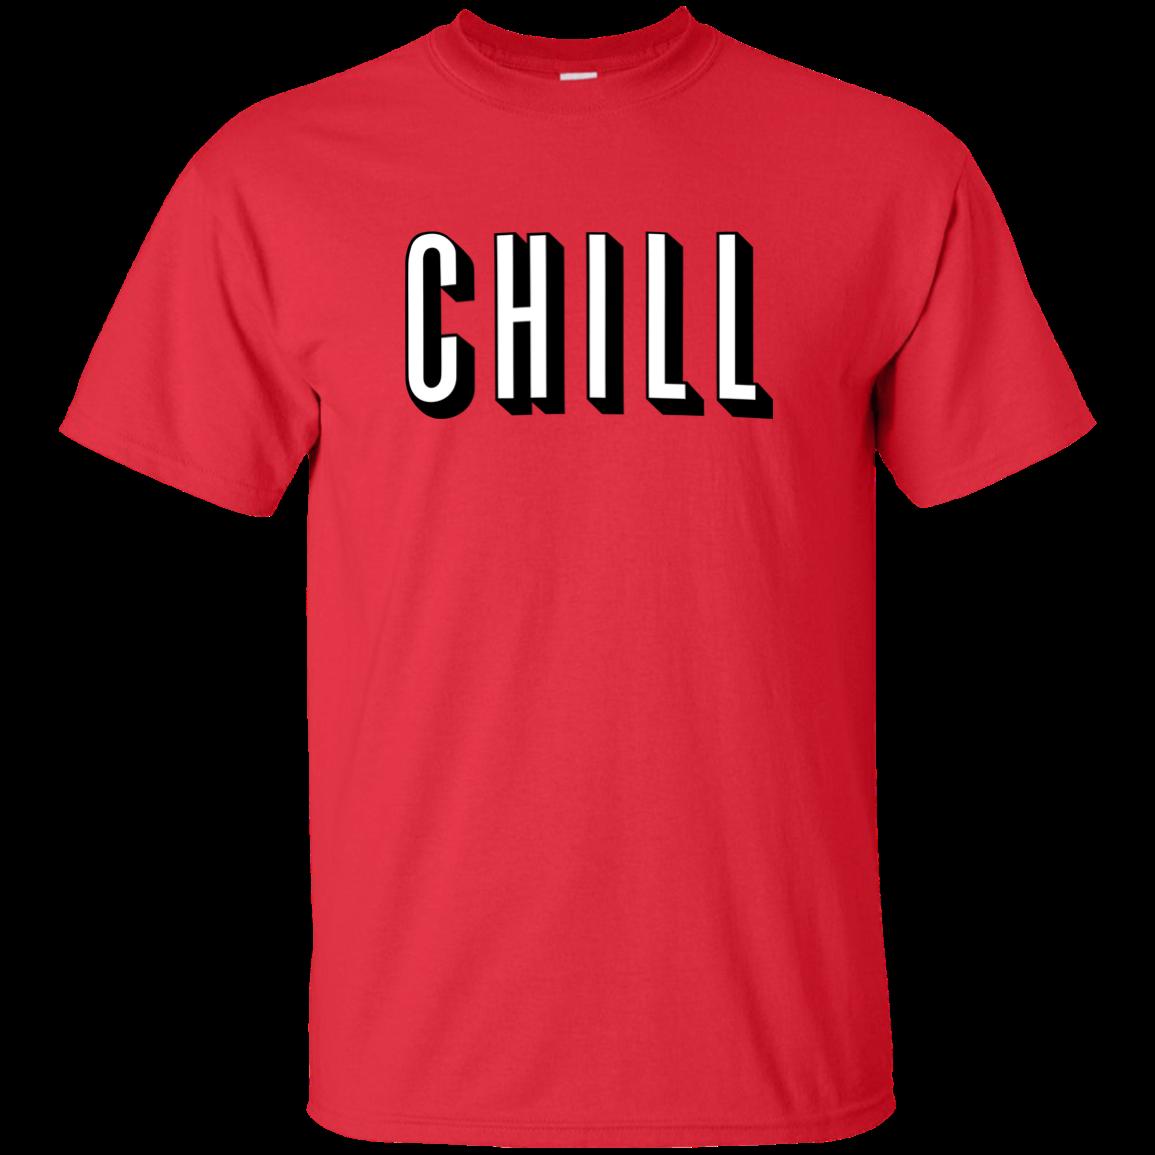 Netflix Chill Logo Parody Shirt, Hoodie, Tank Parody